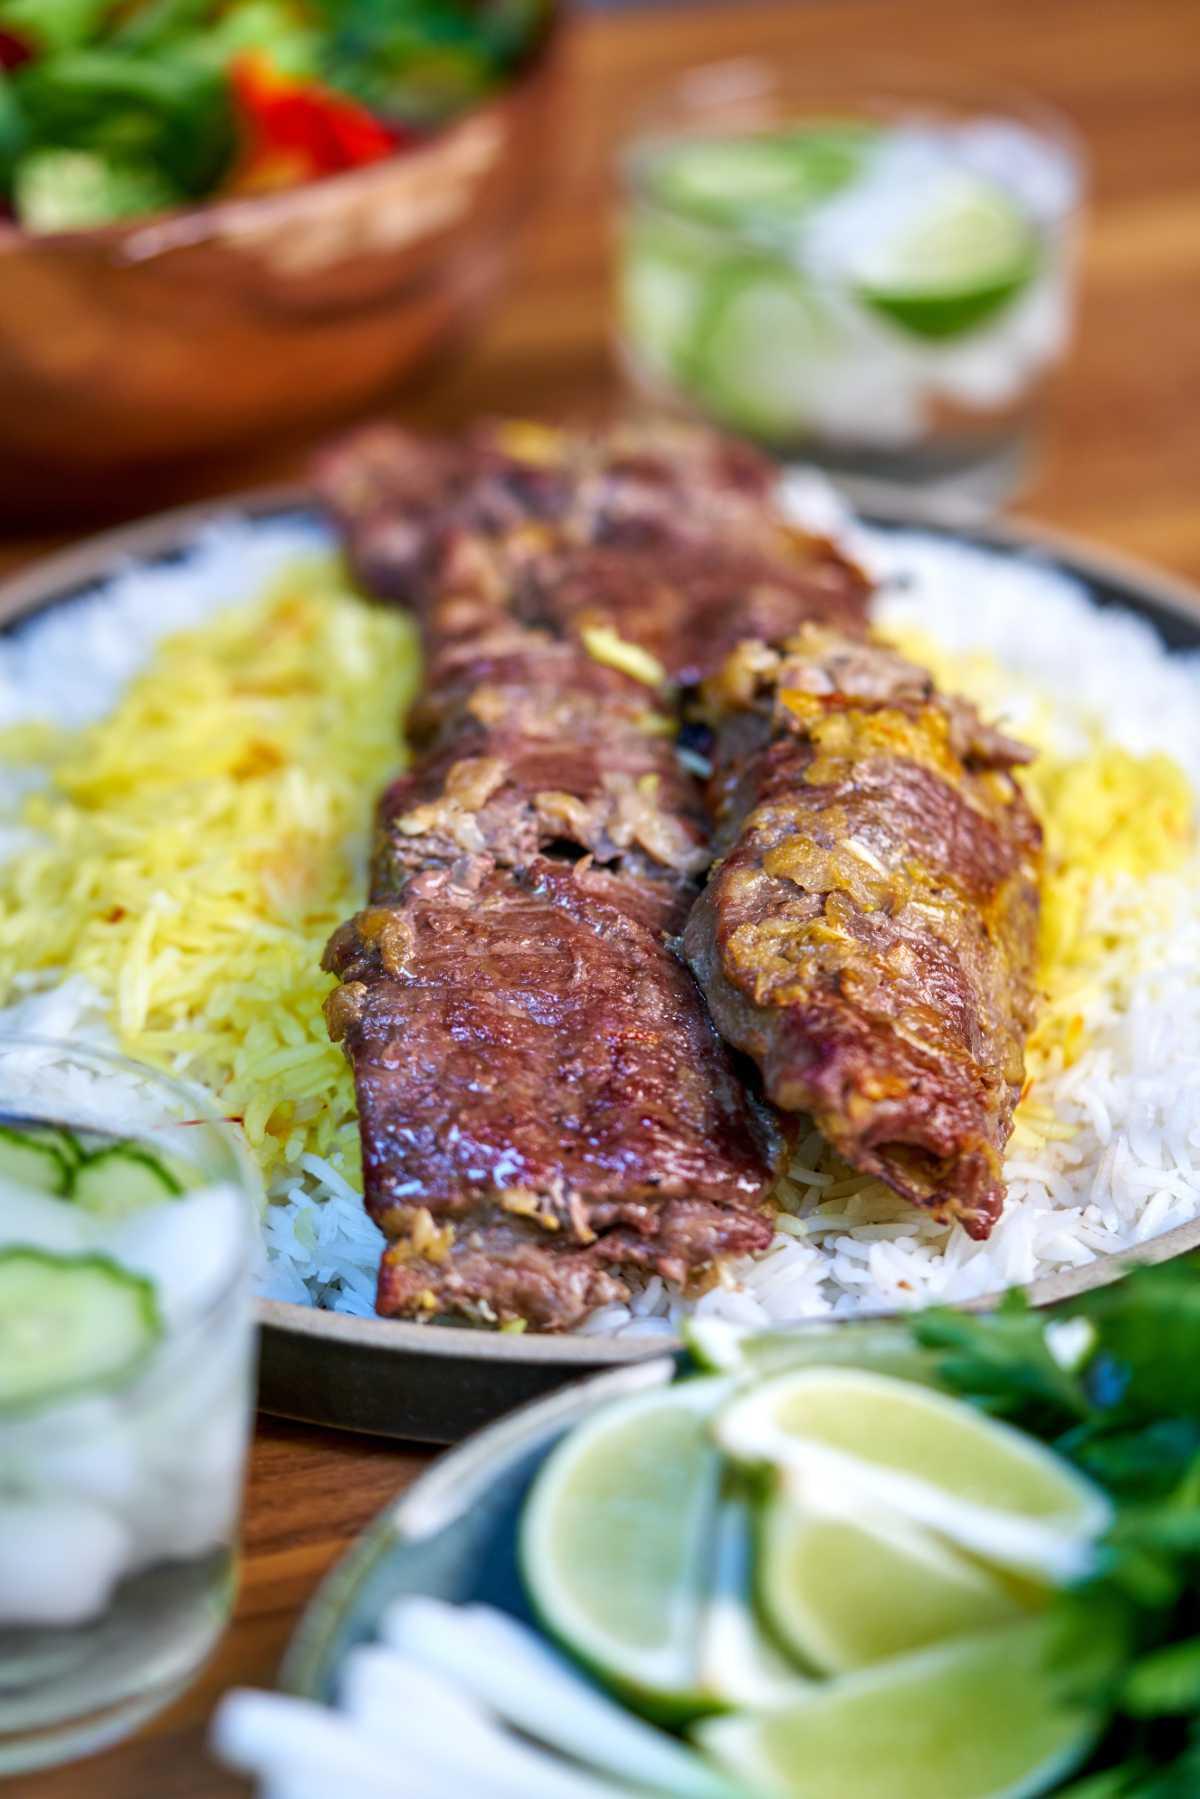 Kabob with rice and salad.